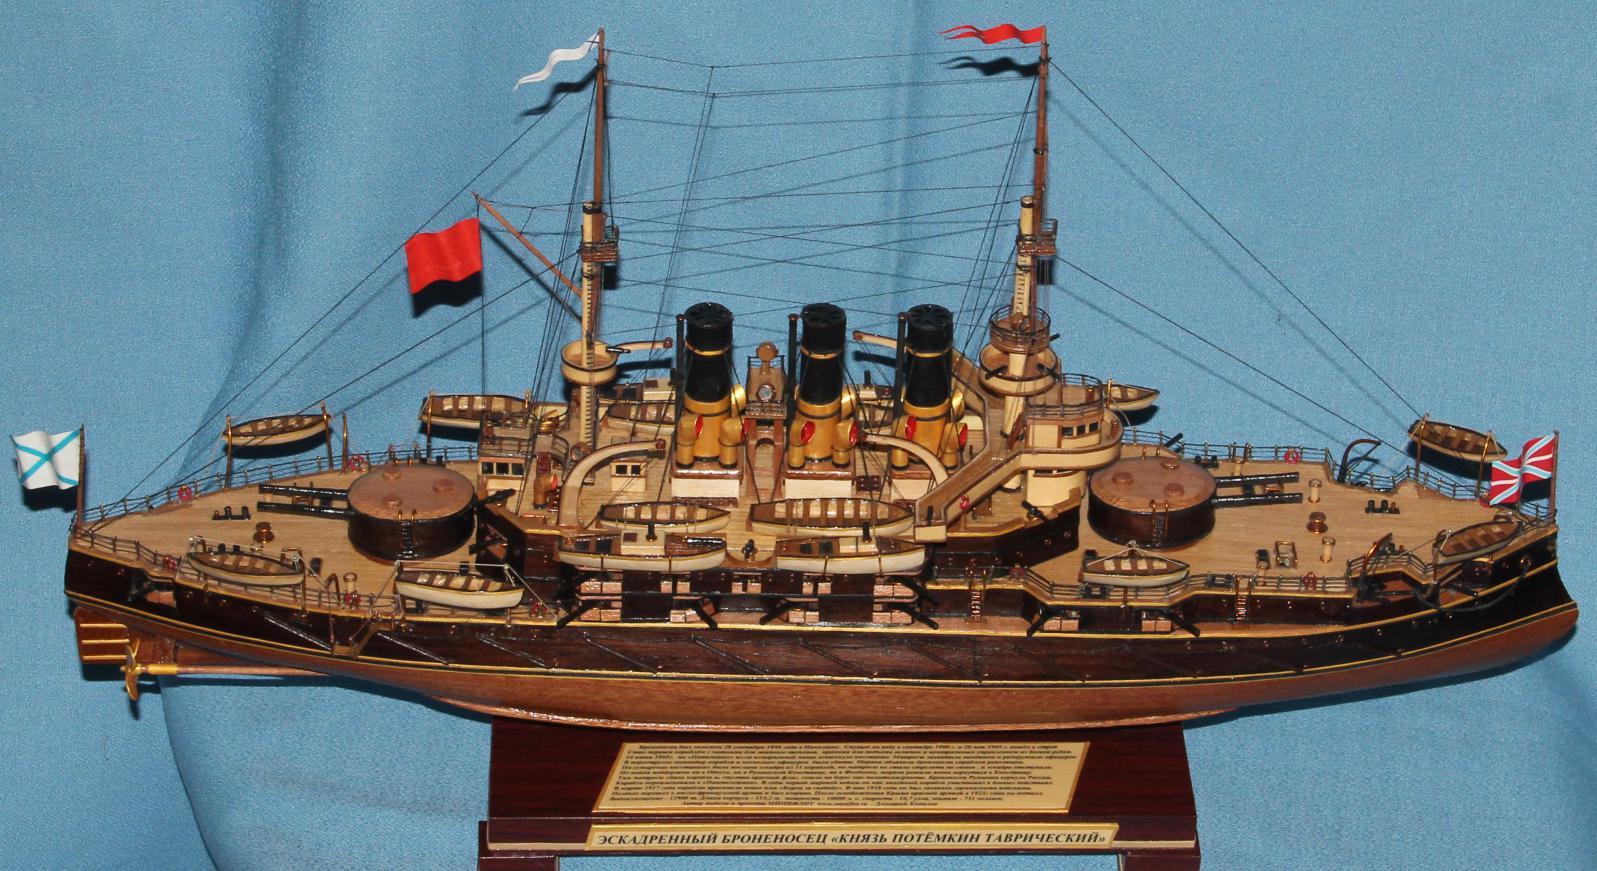 Купить модели кораблей. Броненосец Потёмкин. Броня. Подарки ...